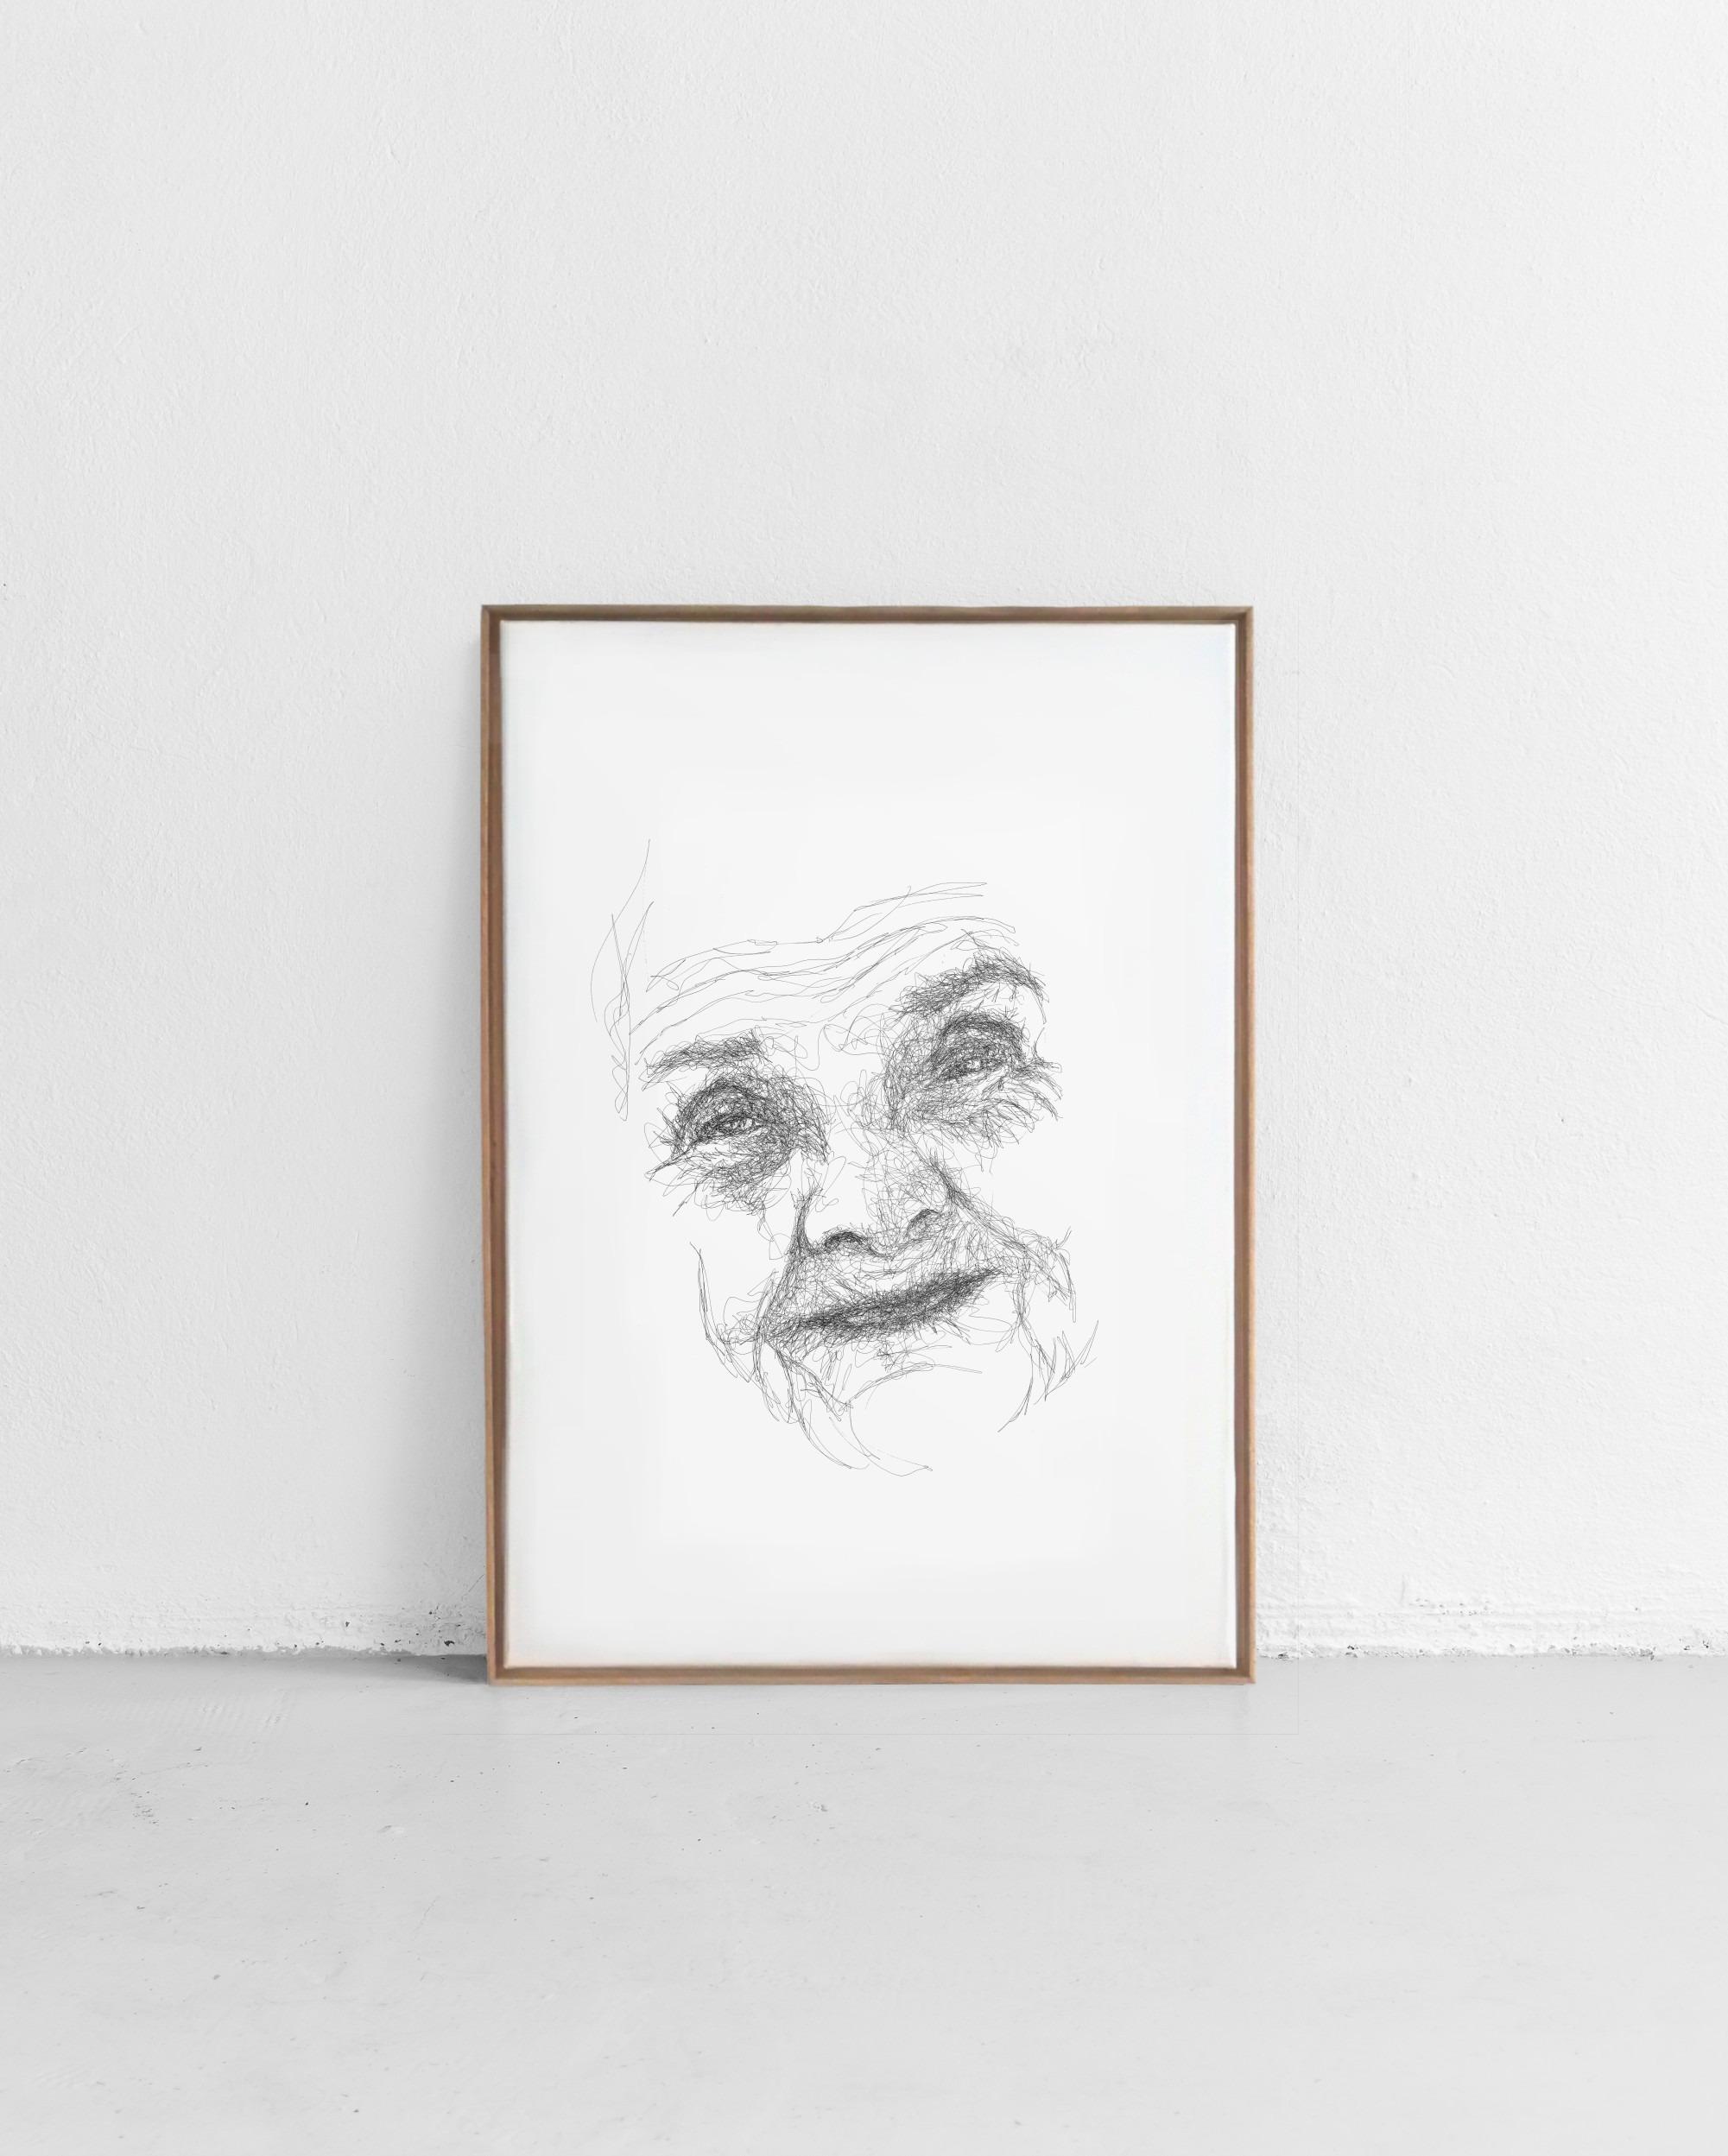 Scribble Face #39